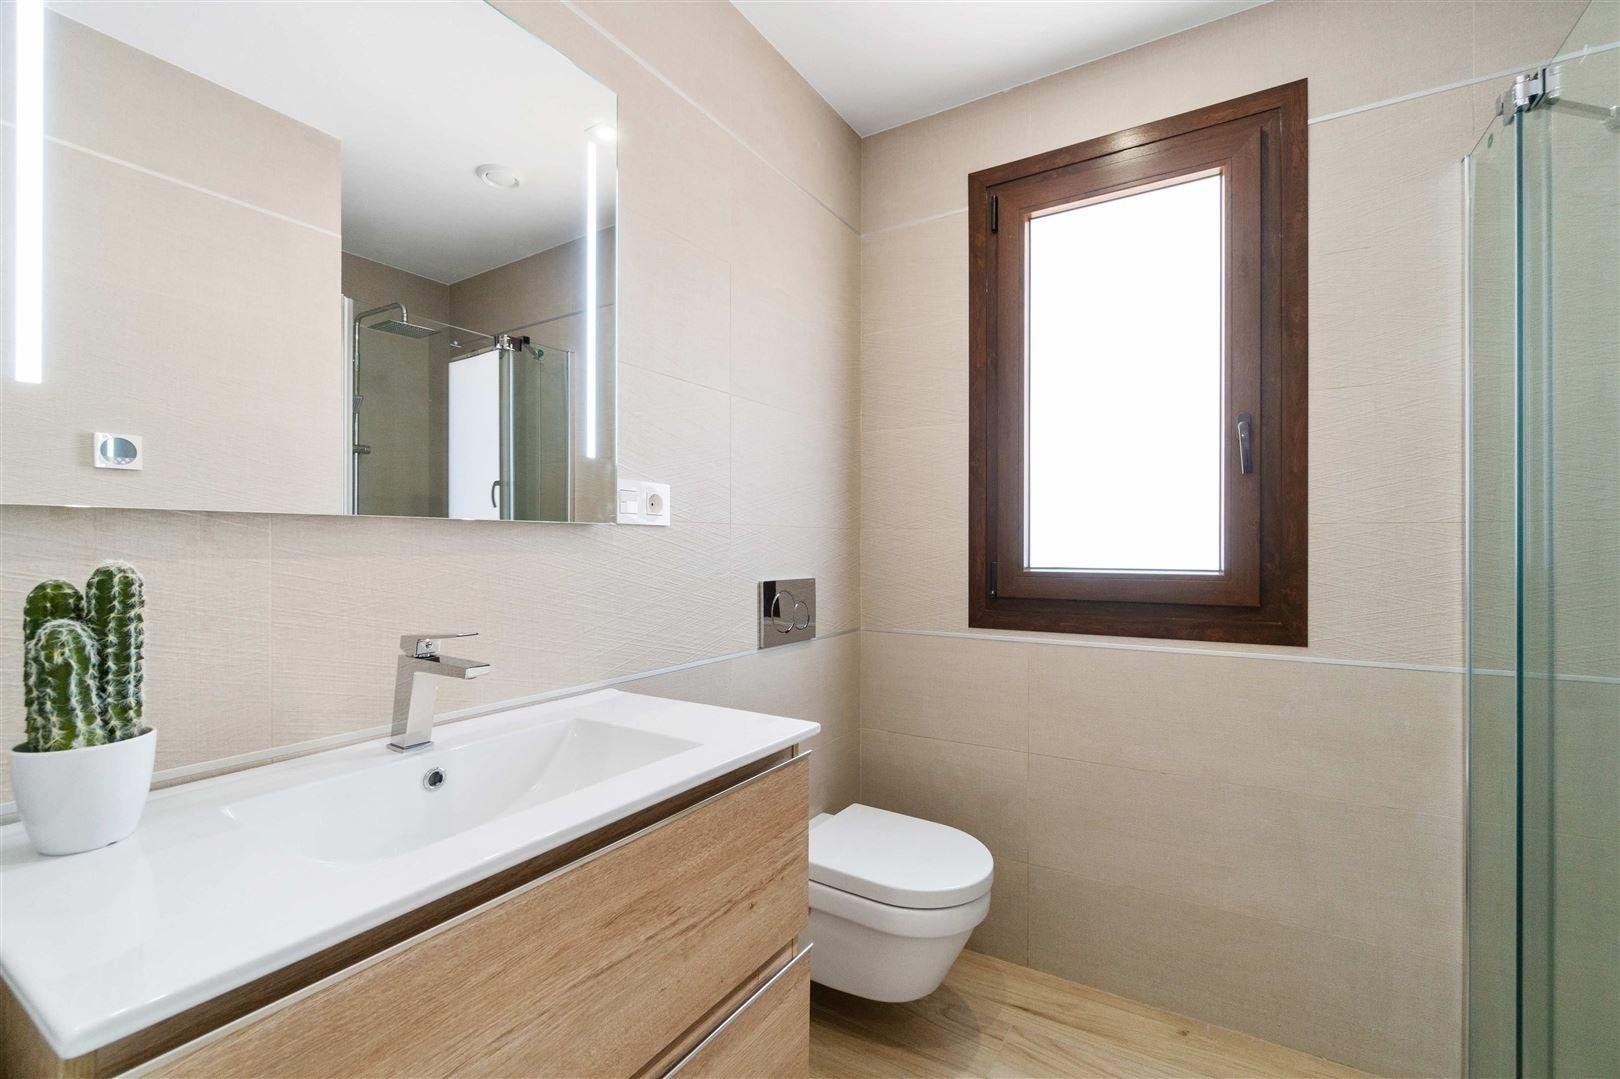 Foto 10 : Appartement te   (Spanje) - Prijs € 169.900